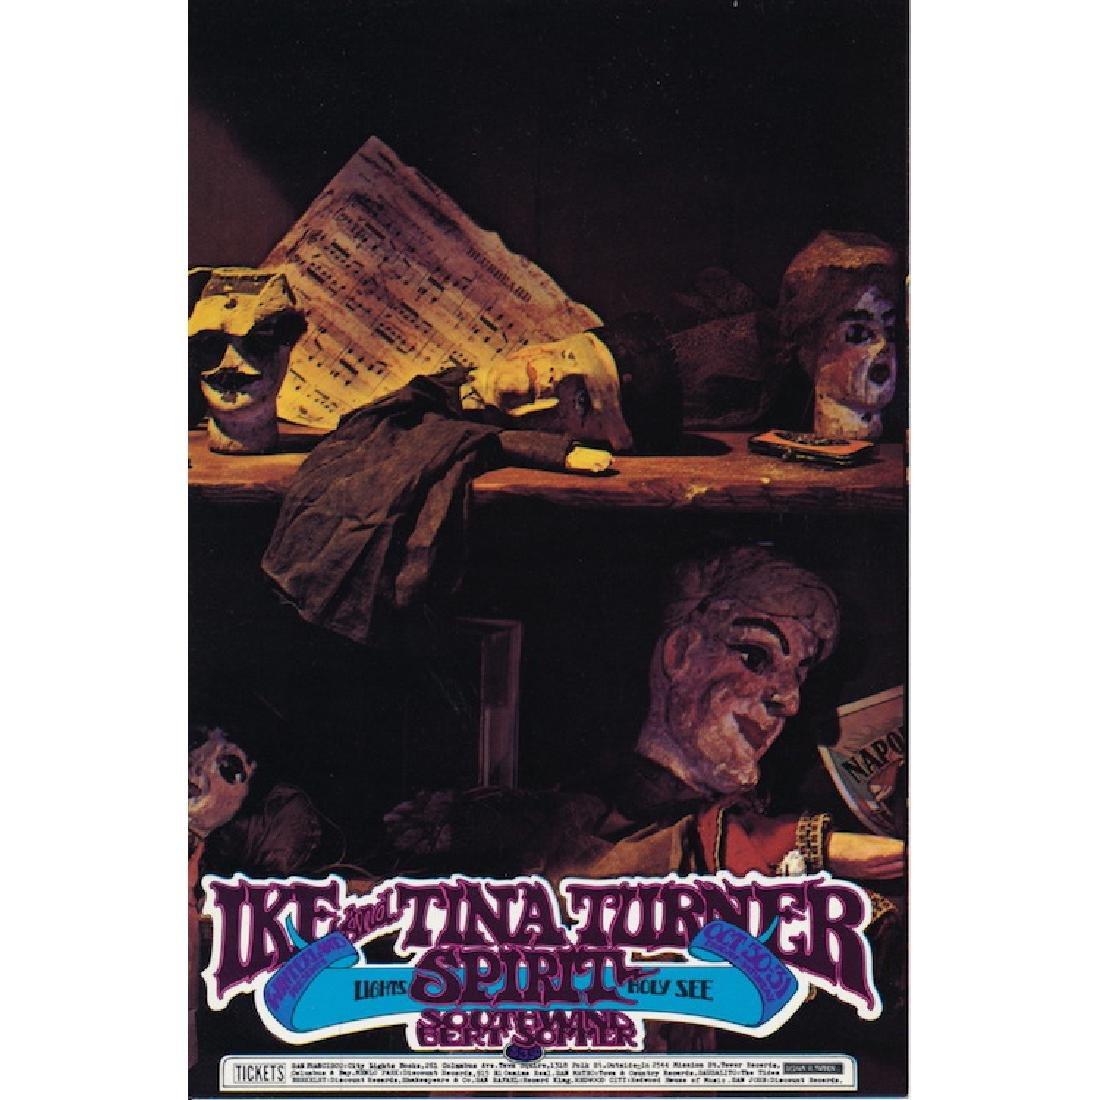 Ike & Tina Turner  - 1970 Concert Handbill